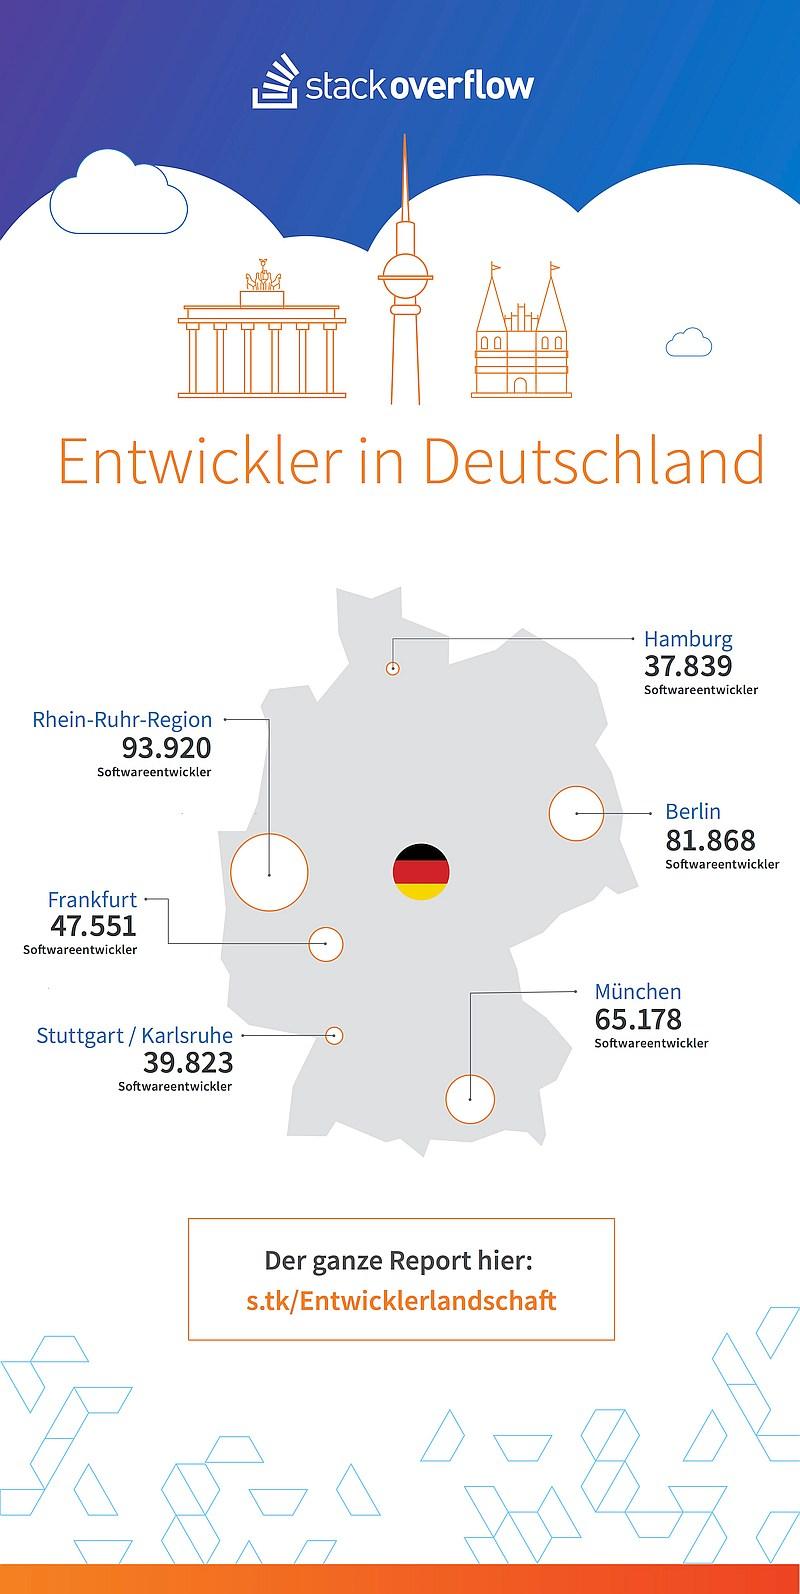 infografik-stack-overflow_report-entwickler-in-deutschland_karte